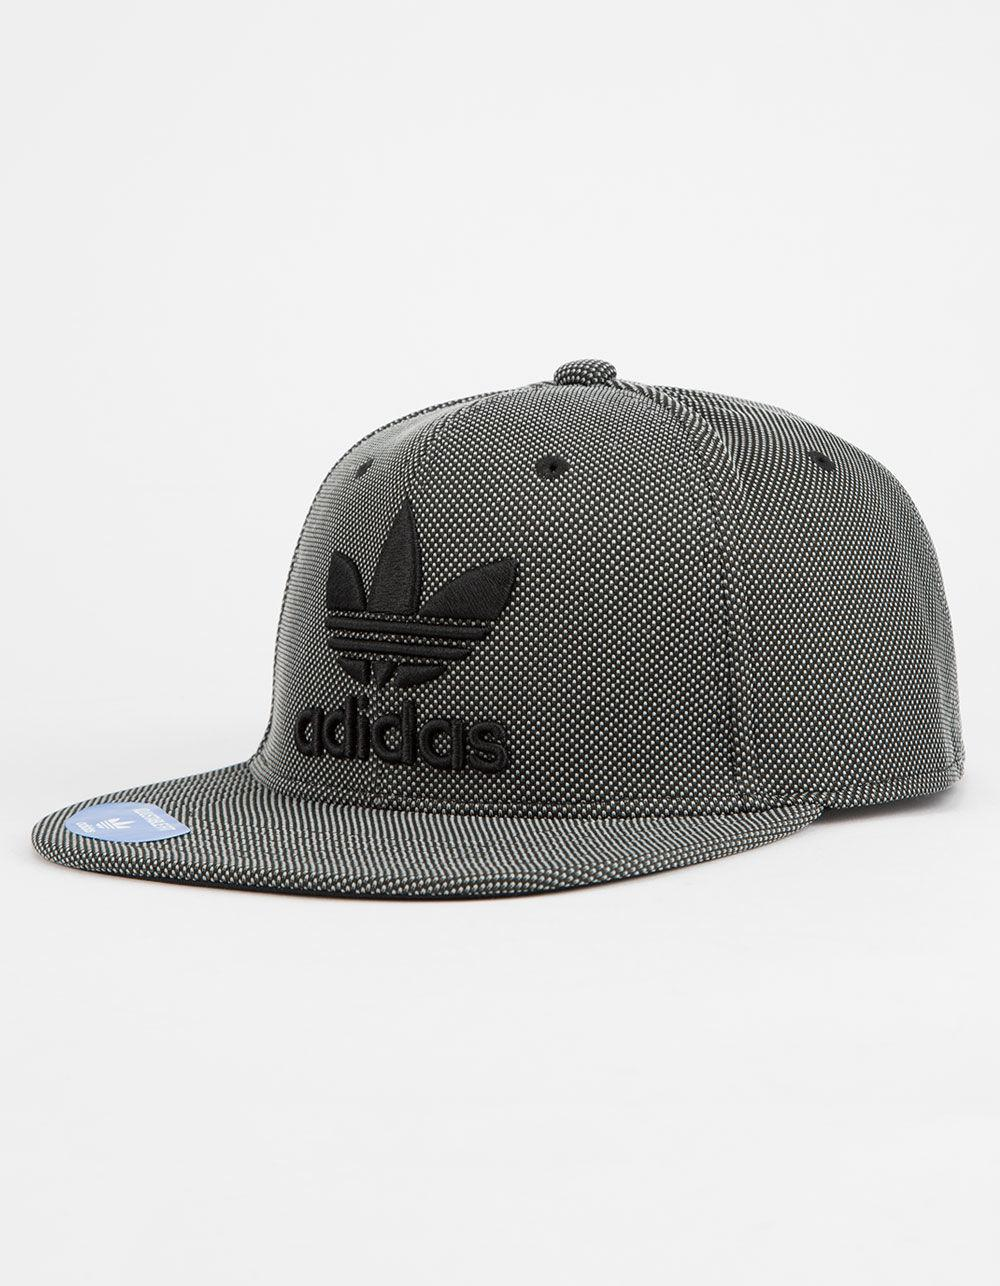 ed71cb40a45 Lyst - adidas Trefoil Plus Men Snapback Hat in Gray for Men